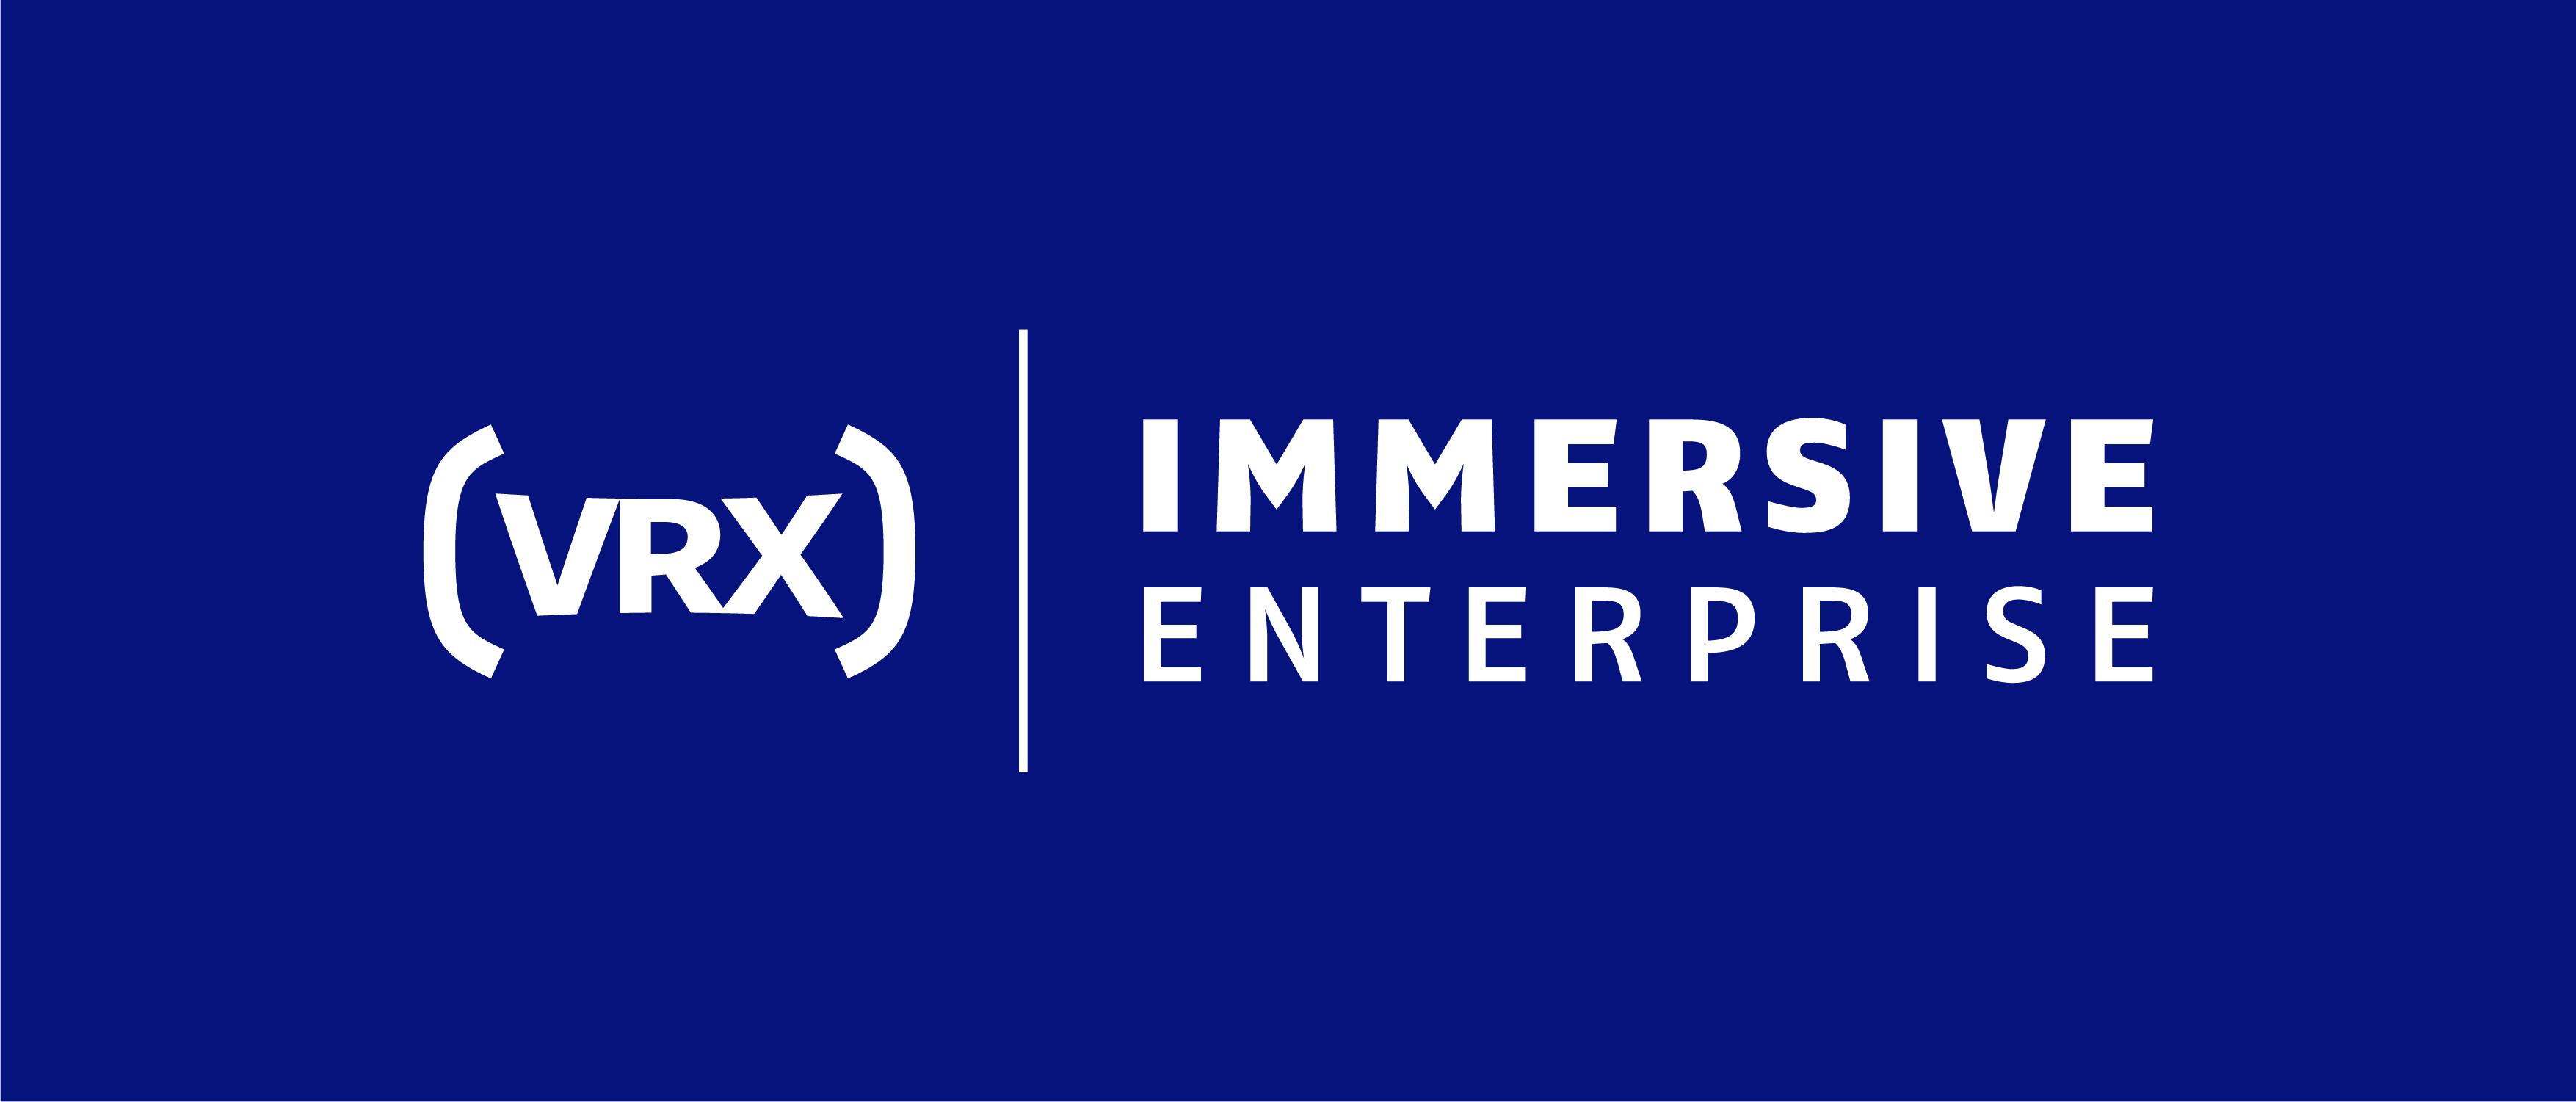 VRX: Immersive Enterprise 2018